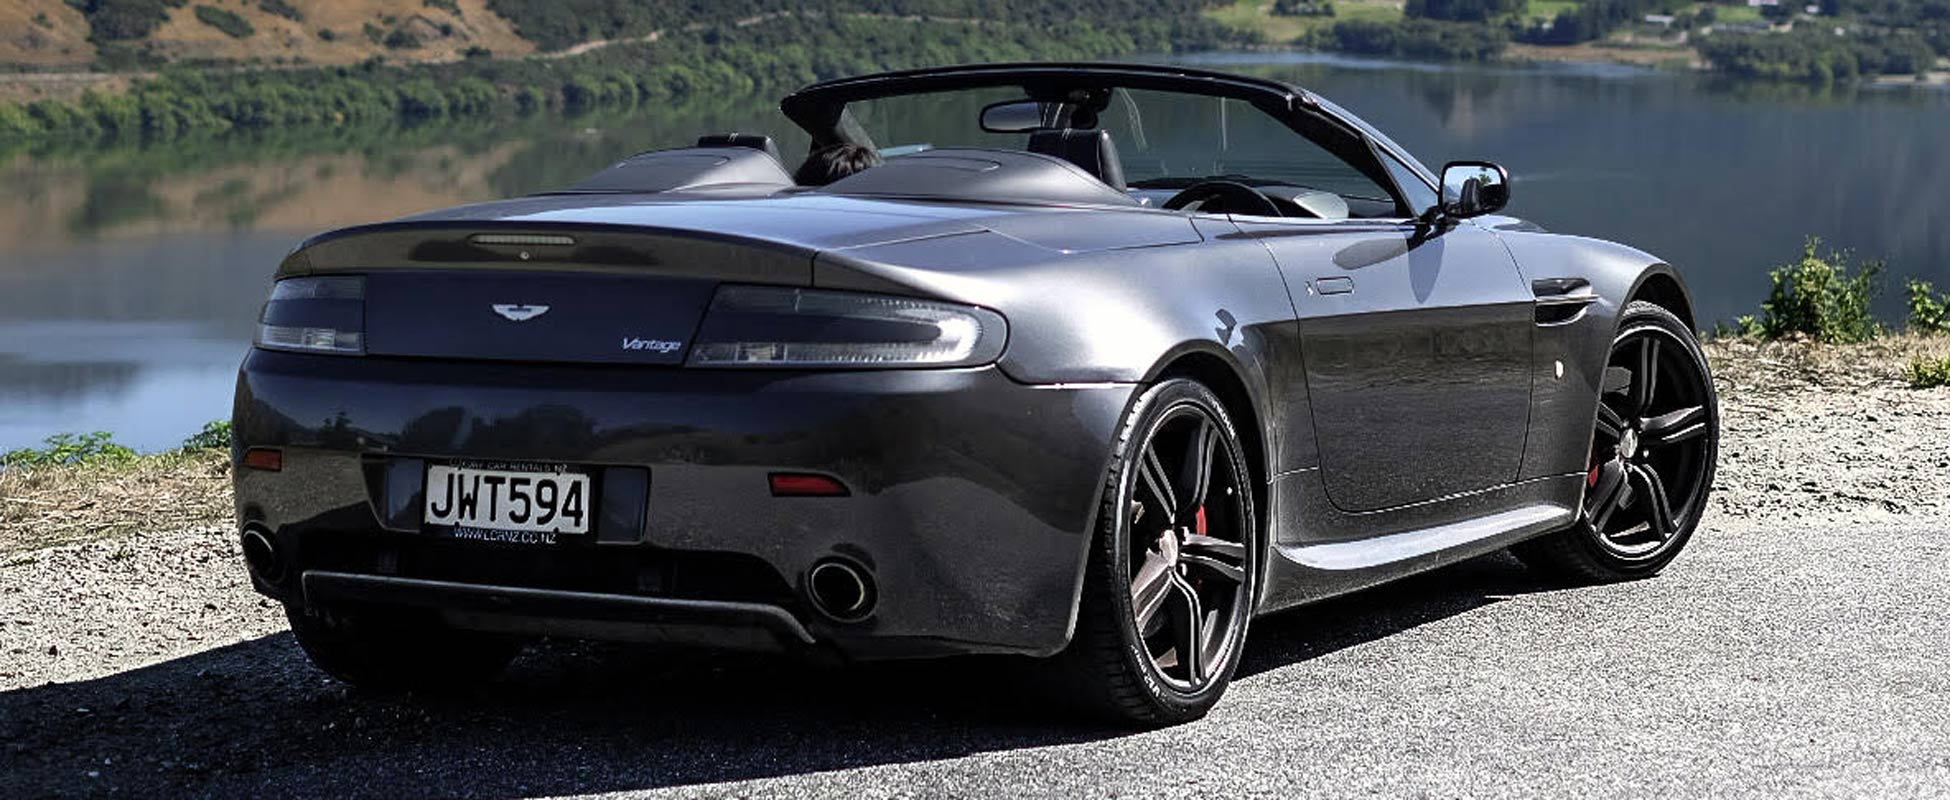 Aston Martin Rental New Zealand V8 Vantage Roadster Hire Nz